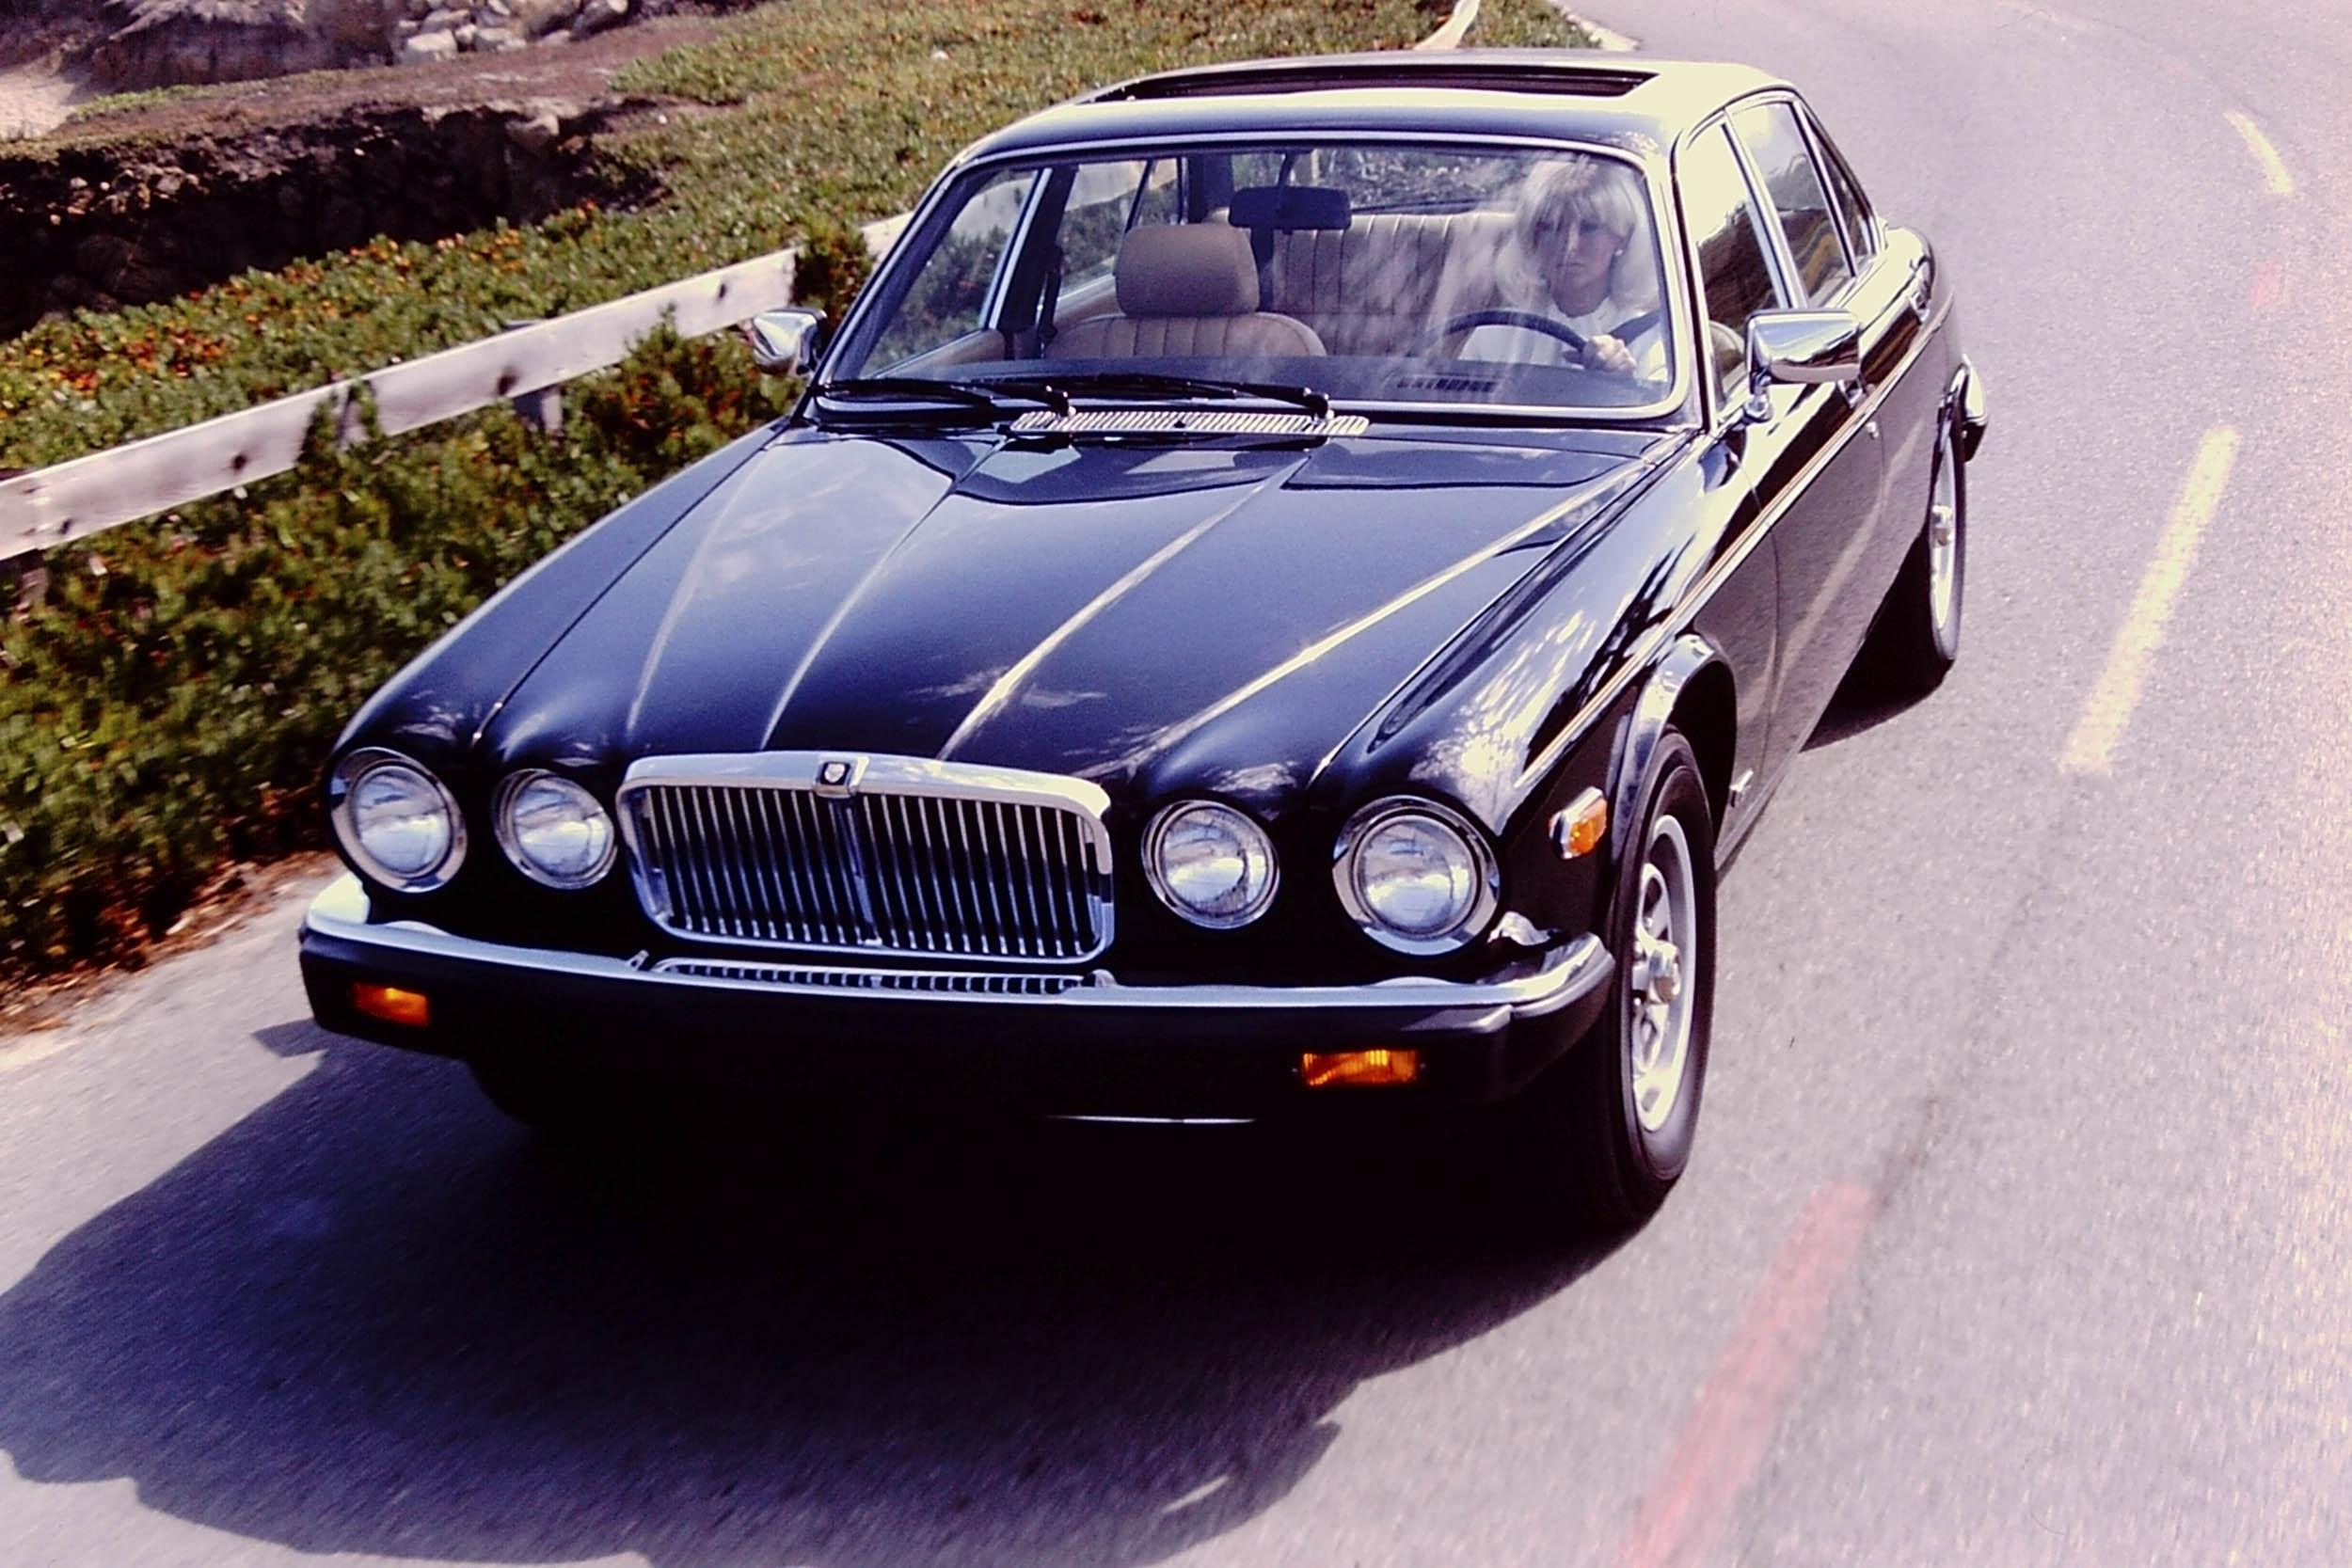 1984 Series III XJ6